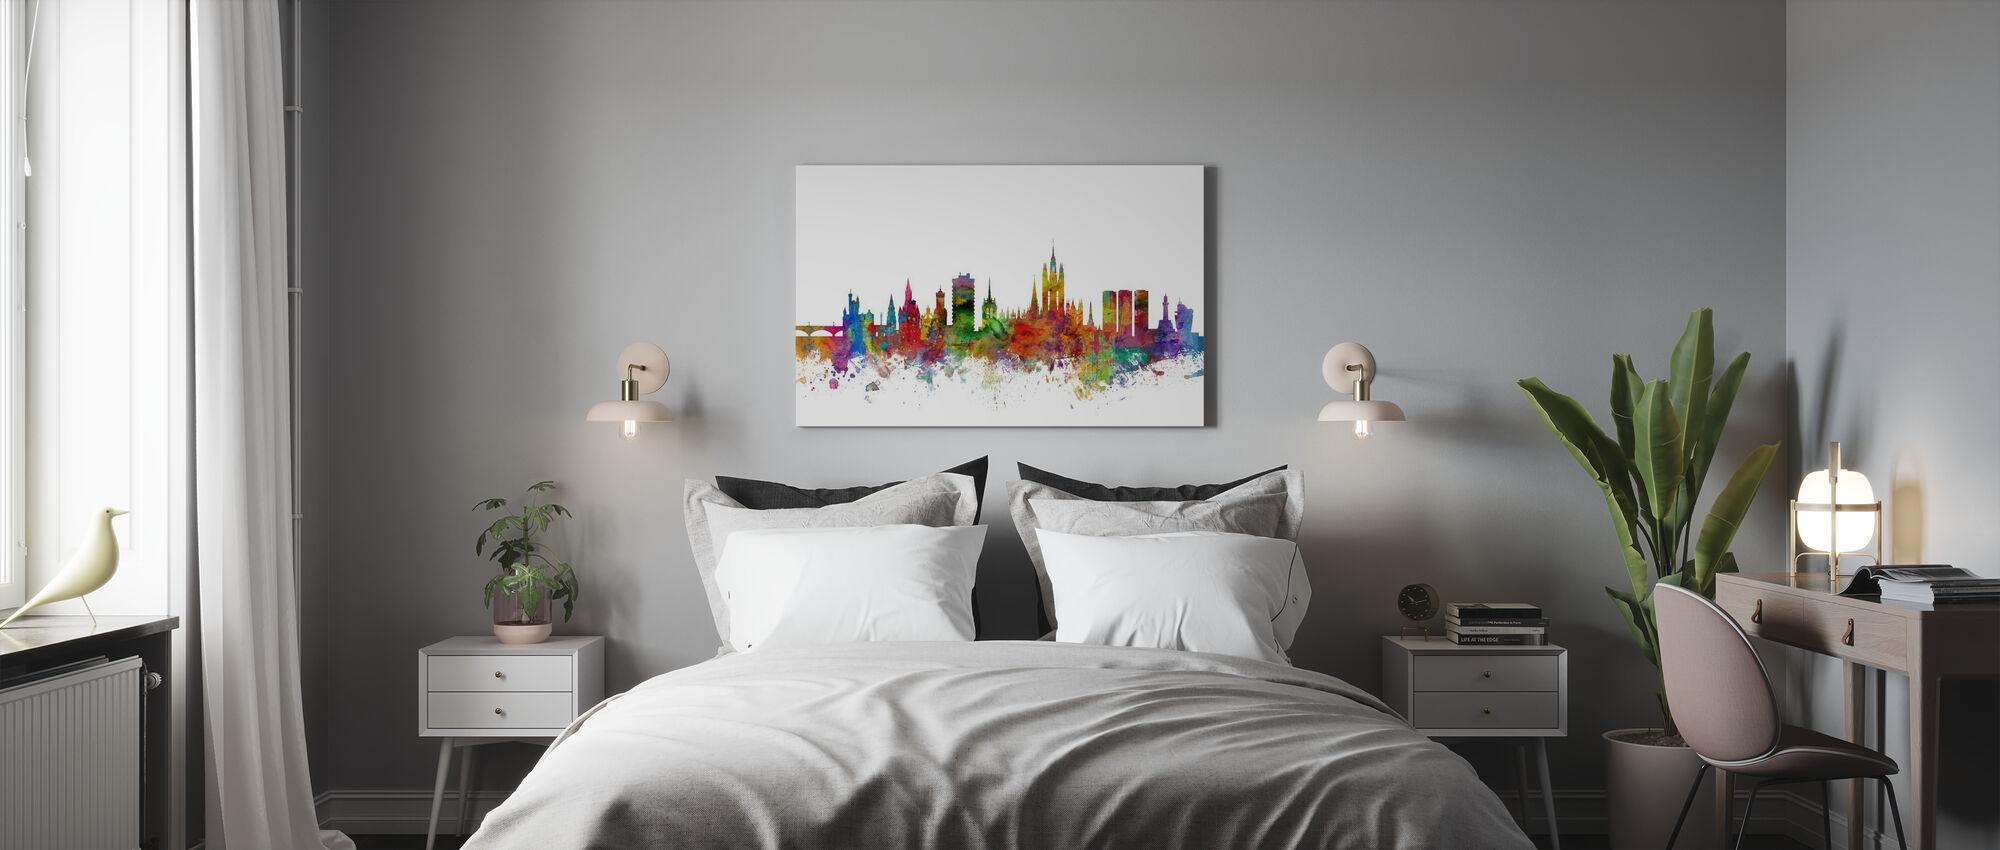 Aberdeen Scotland Skyline - Canvas print - Bedroom